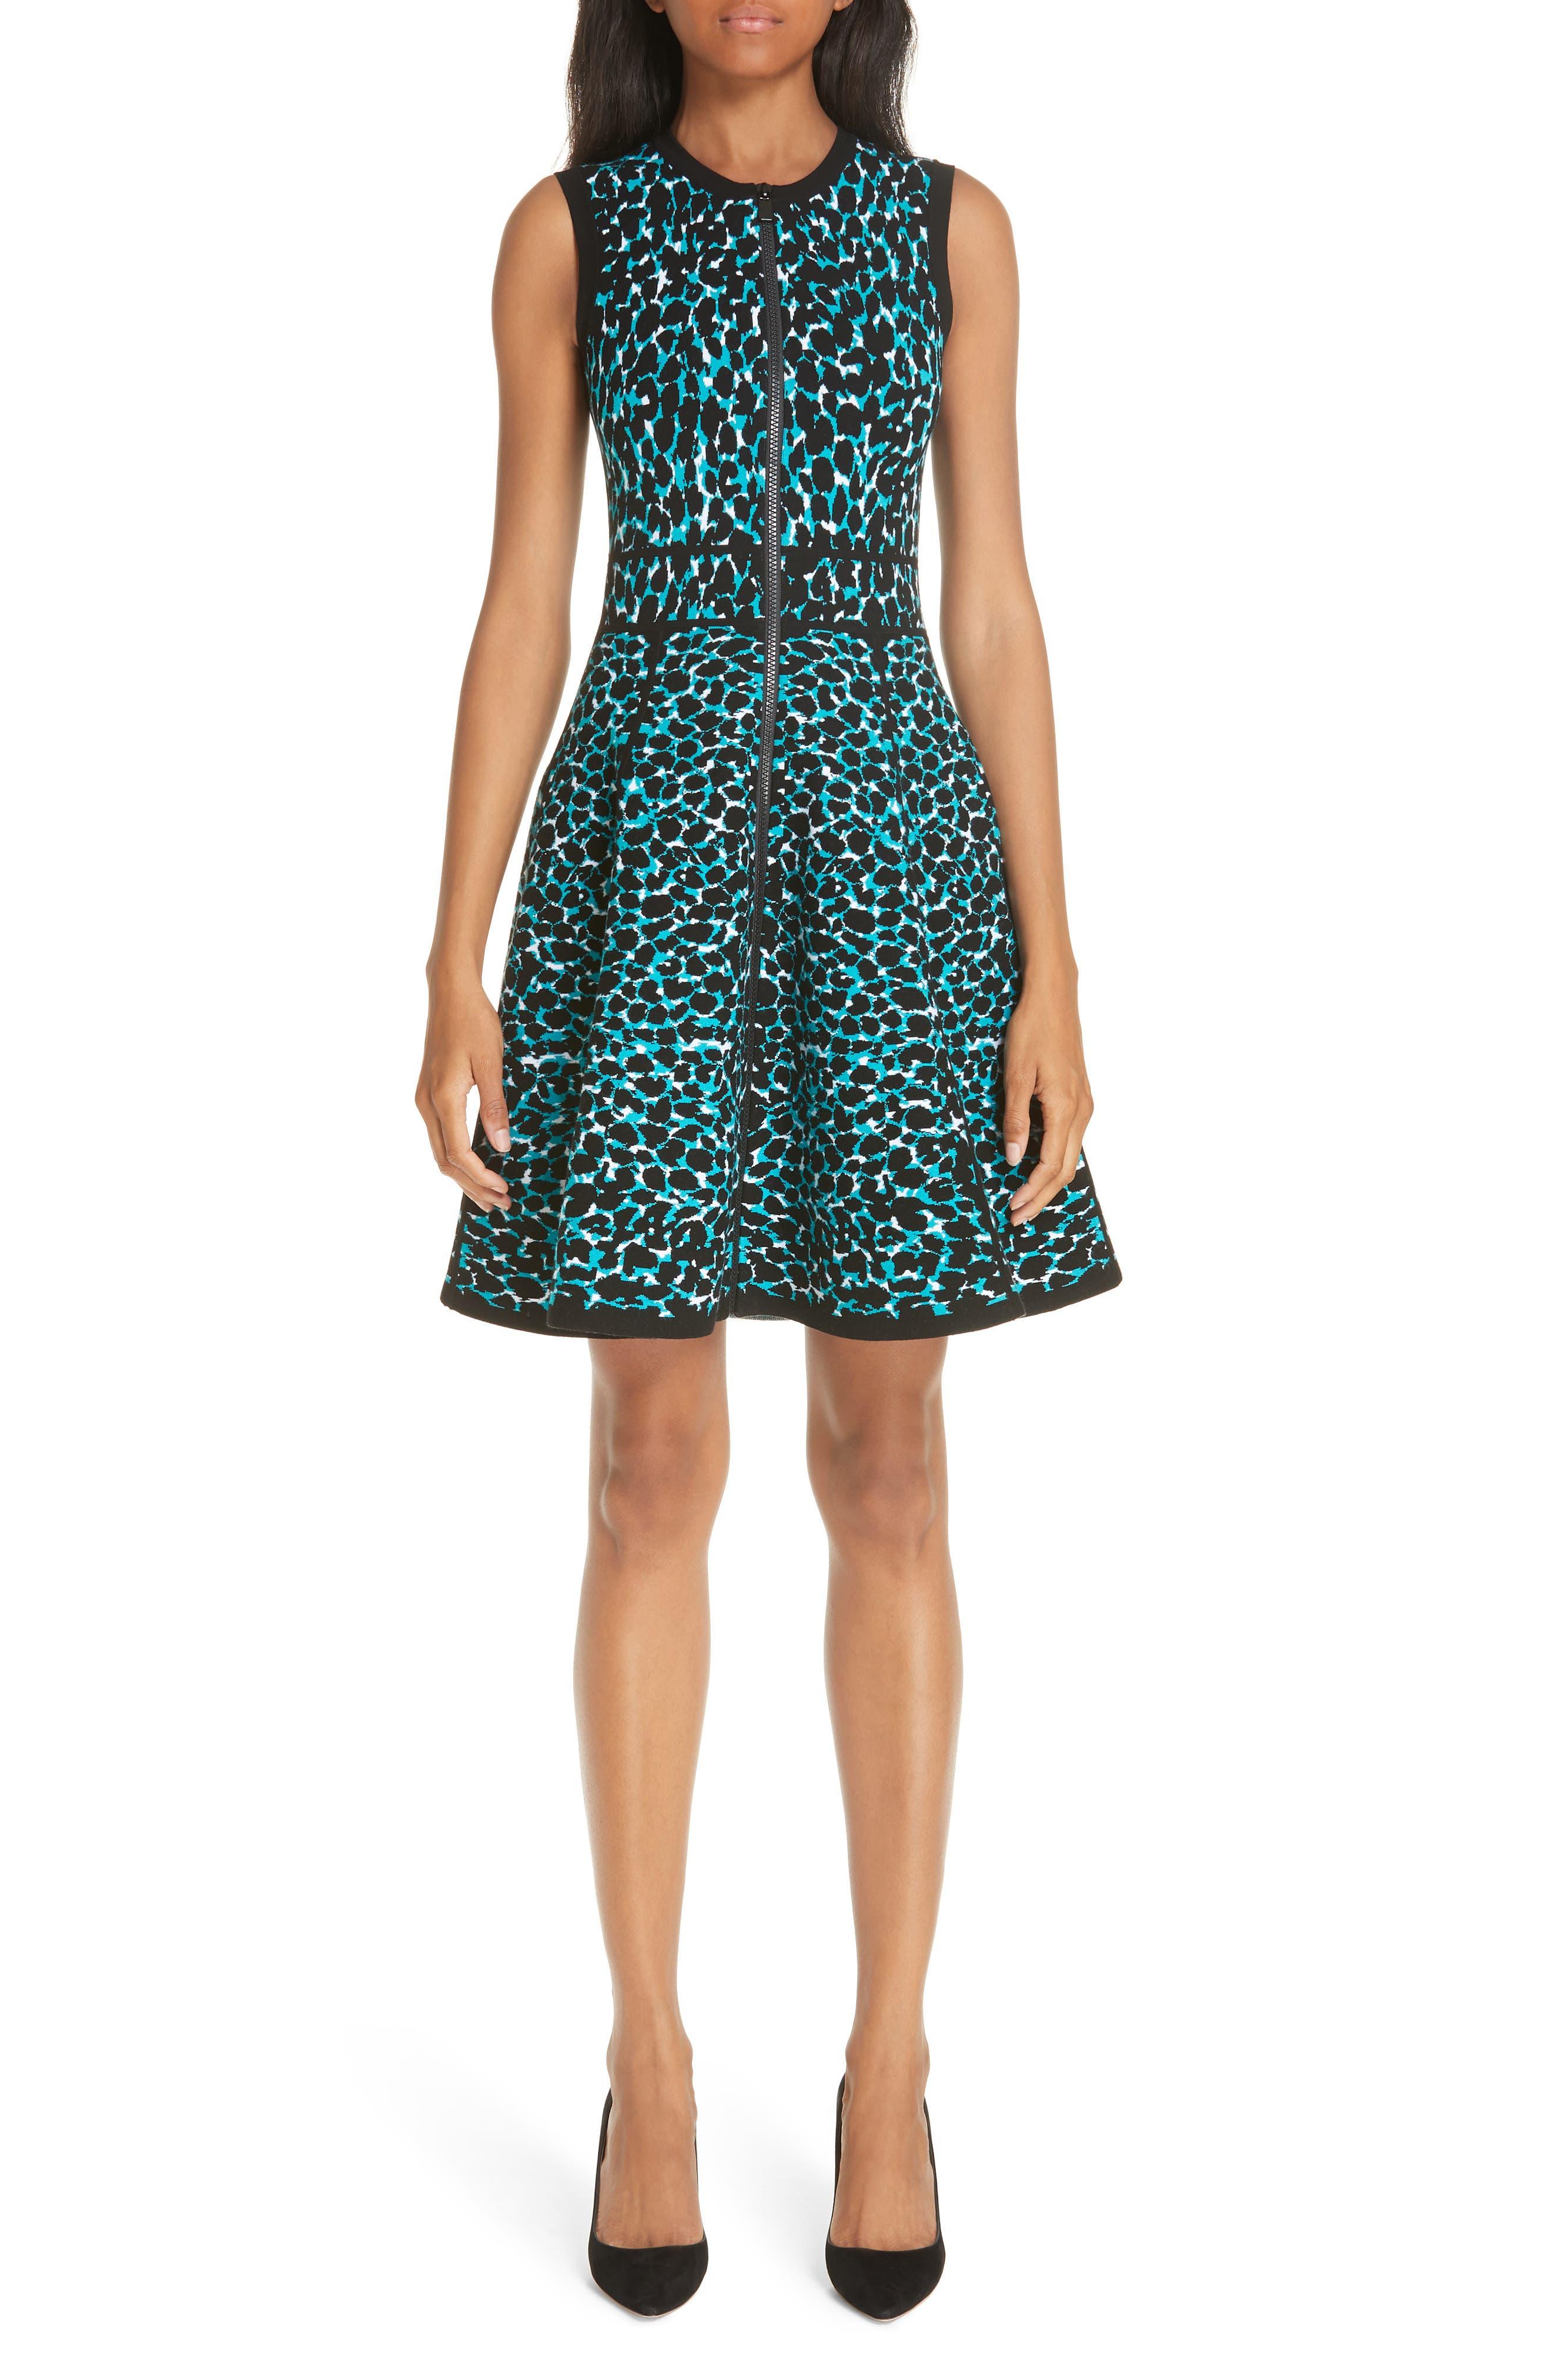 Leopard Print Zip Front Fit & Flare Dress, Main, color, TURQUOISE W/ BLACK